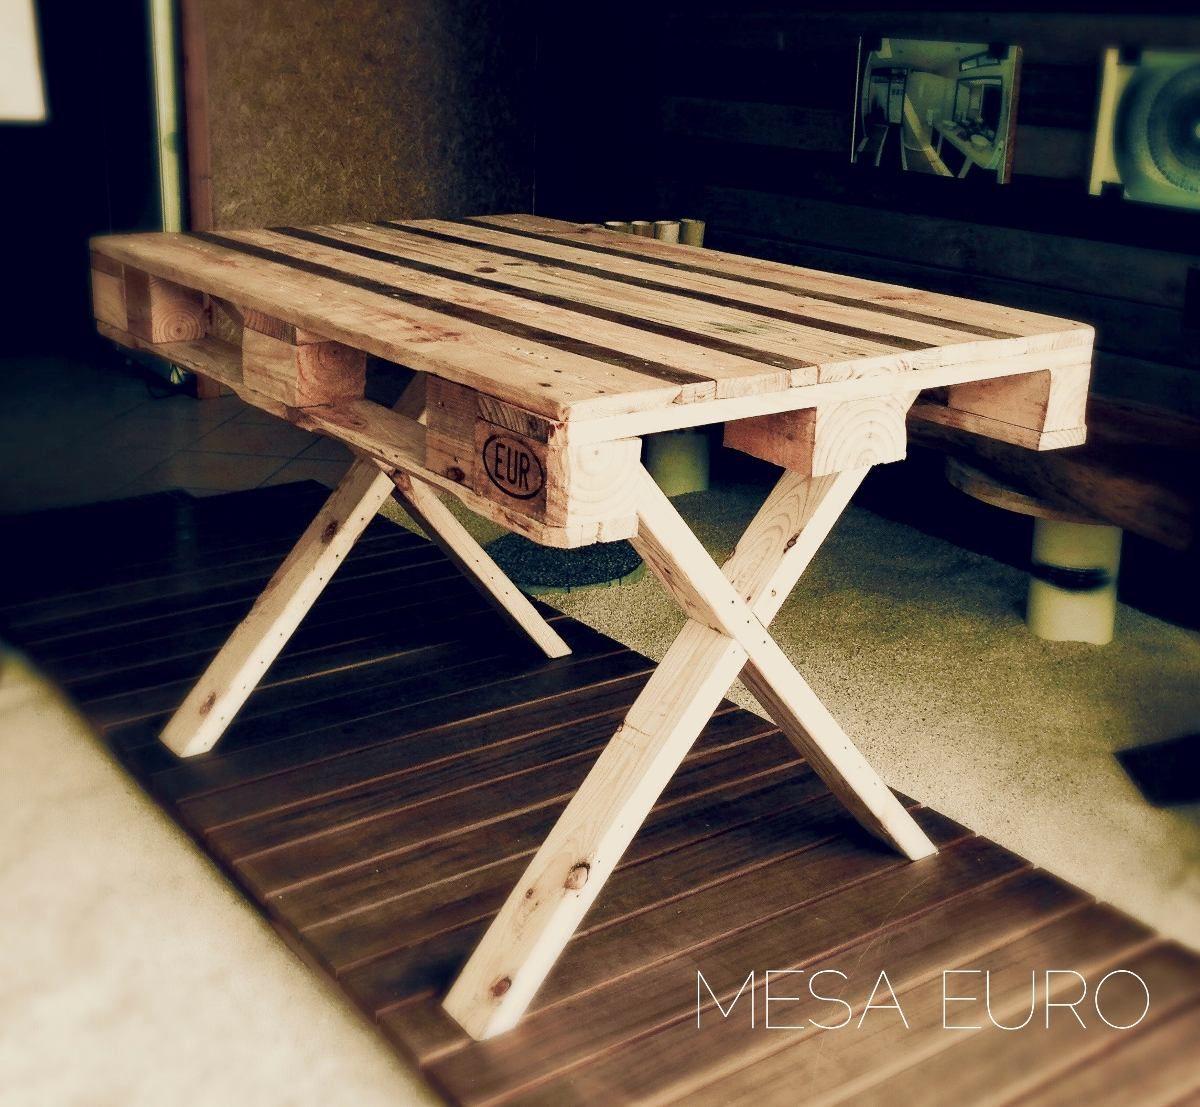 mesa comedor picnic 4 pers para exterior de madera reciclada 180000 en mercadolibre - Mesas Con Palets